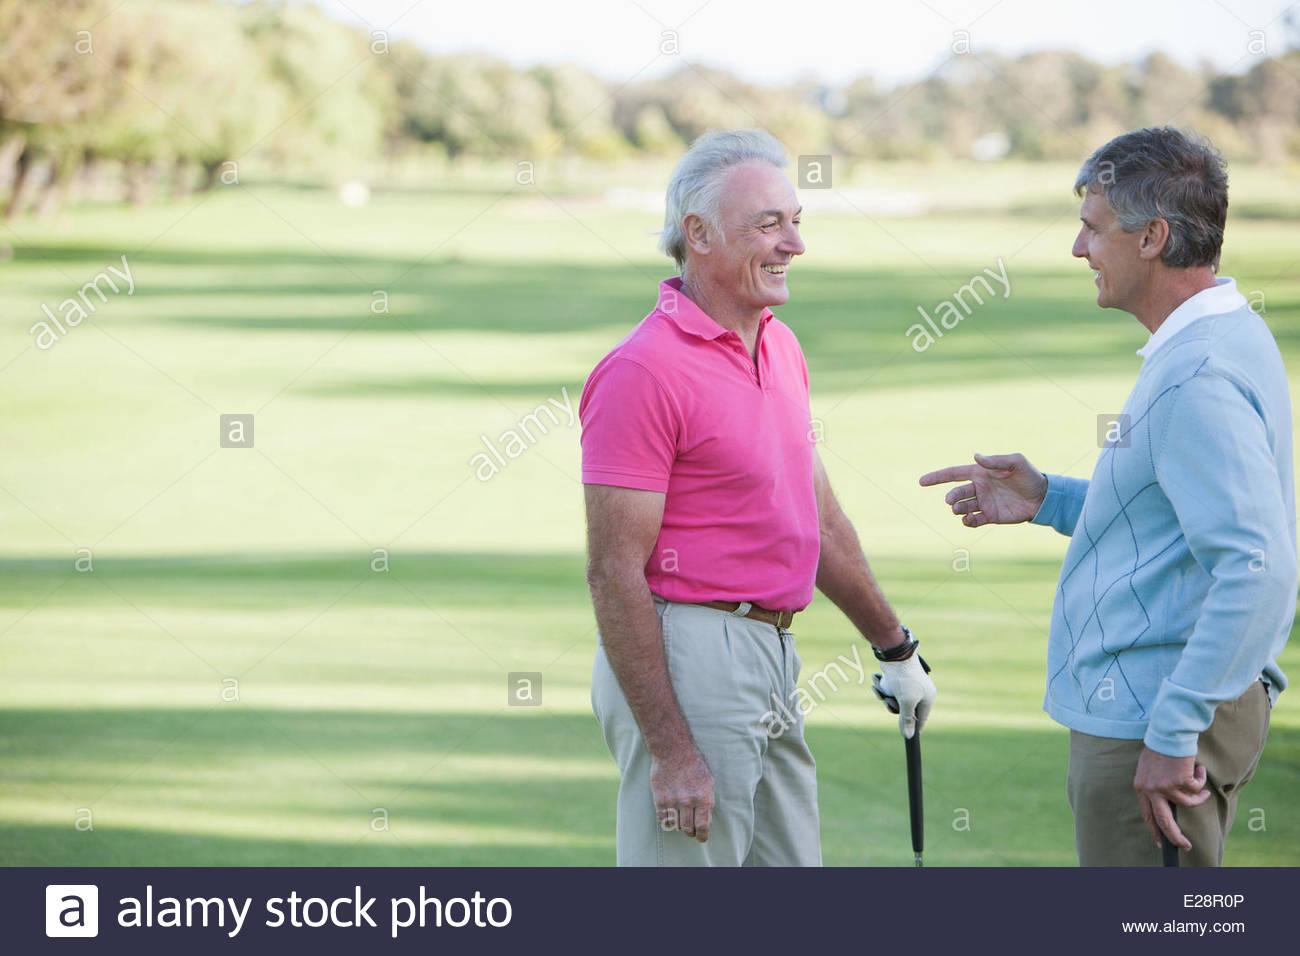 Men talking on golf course - Stock Image